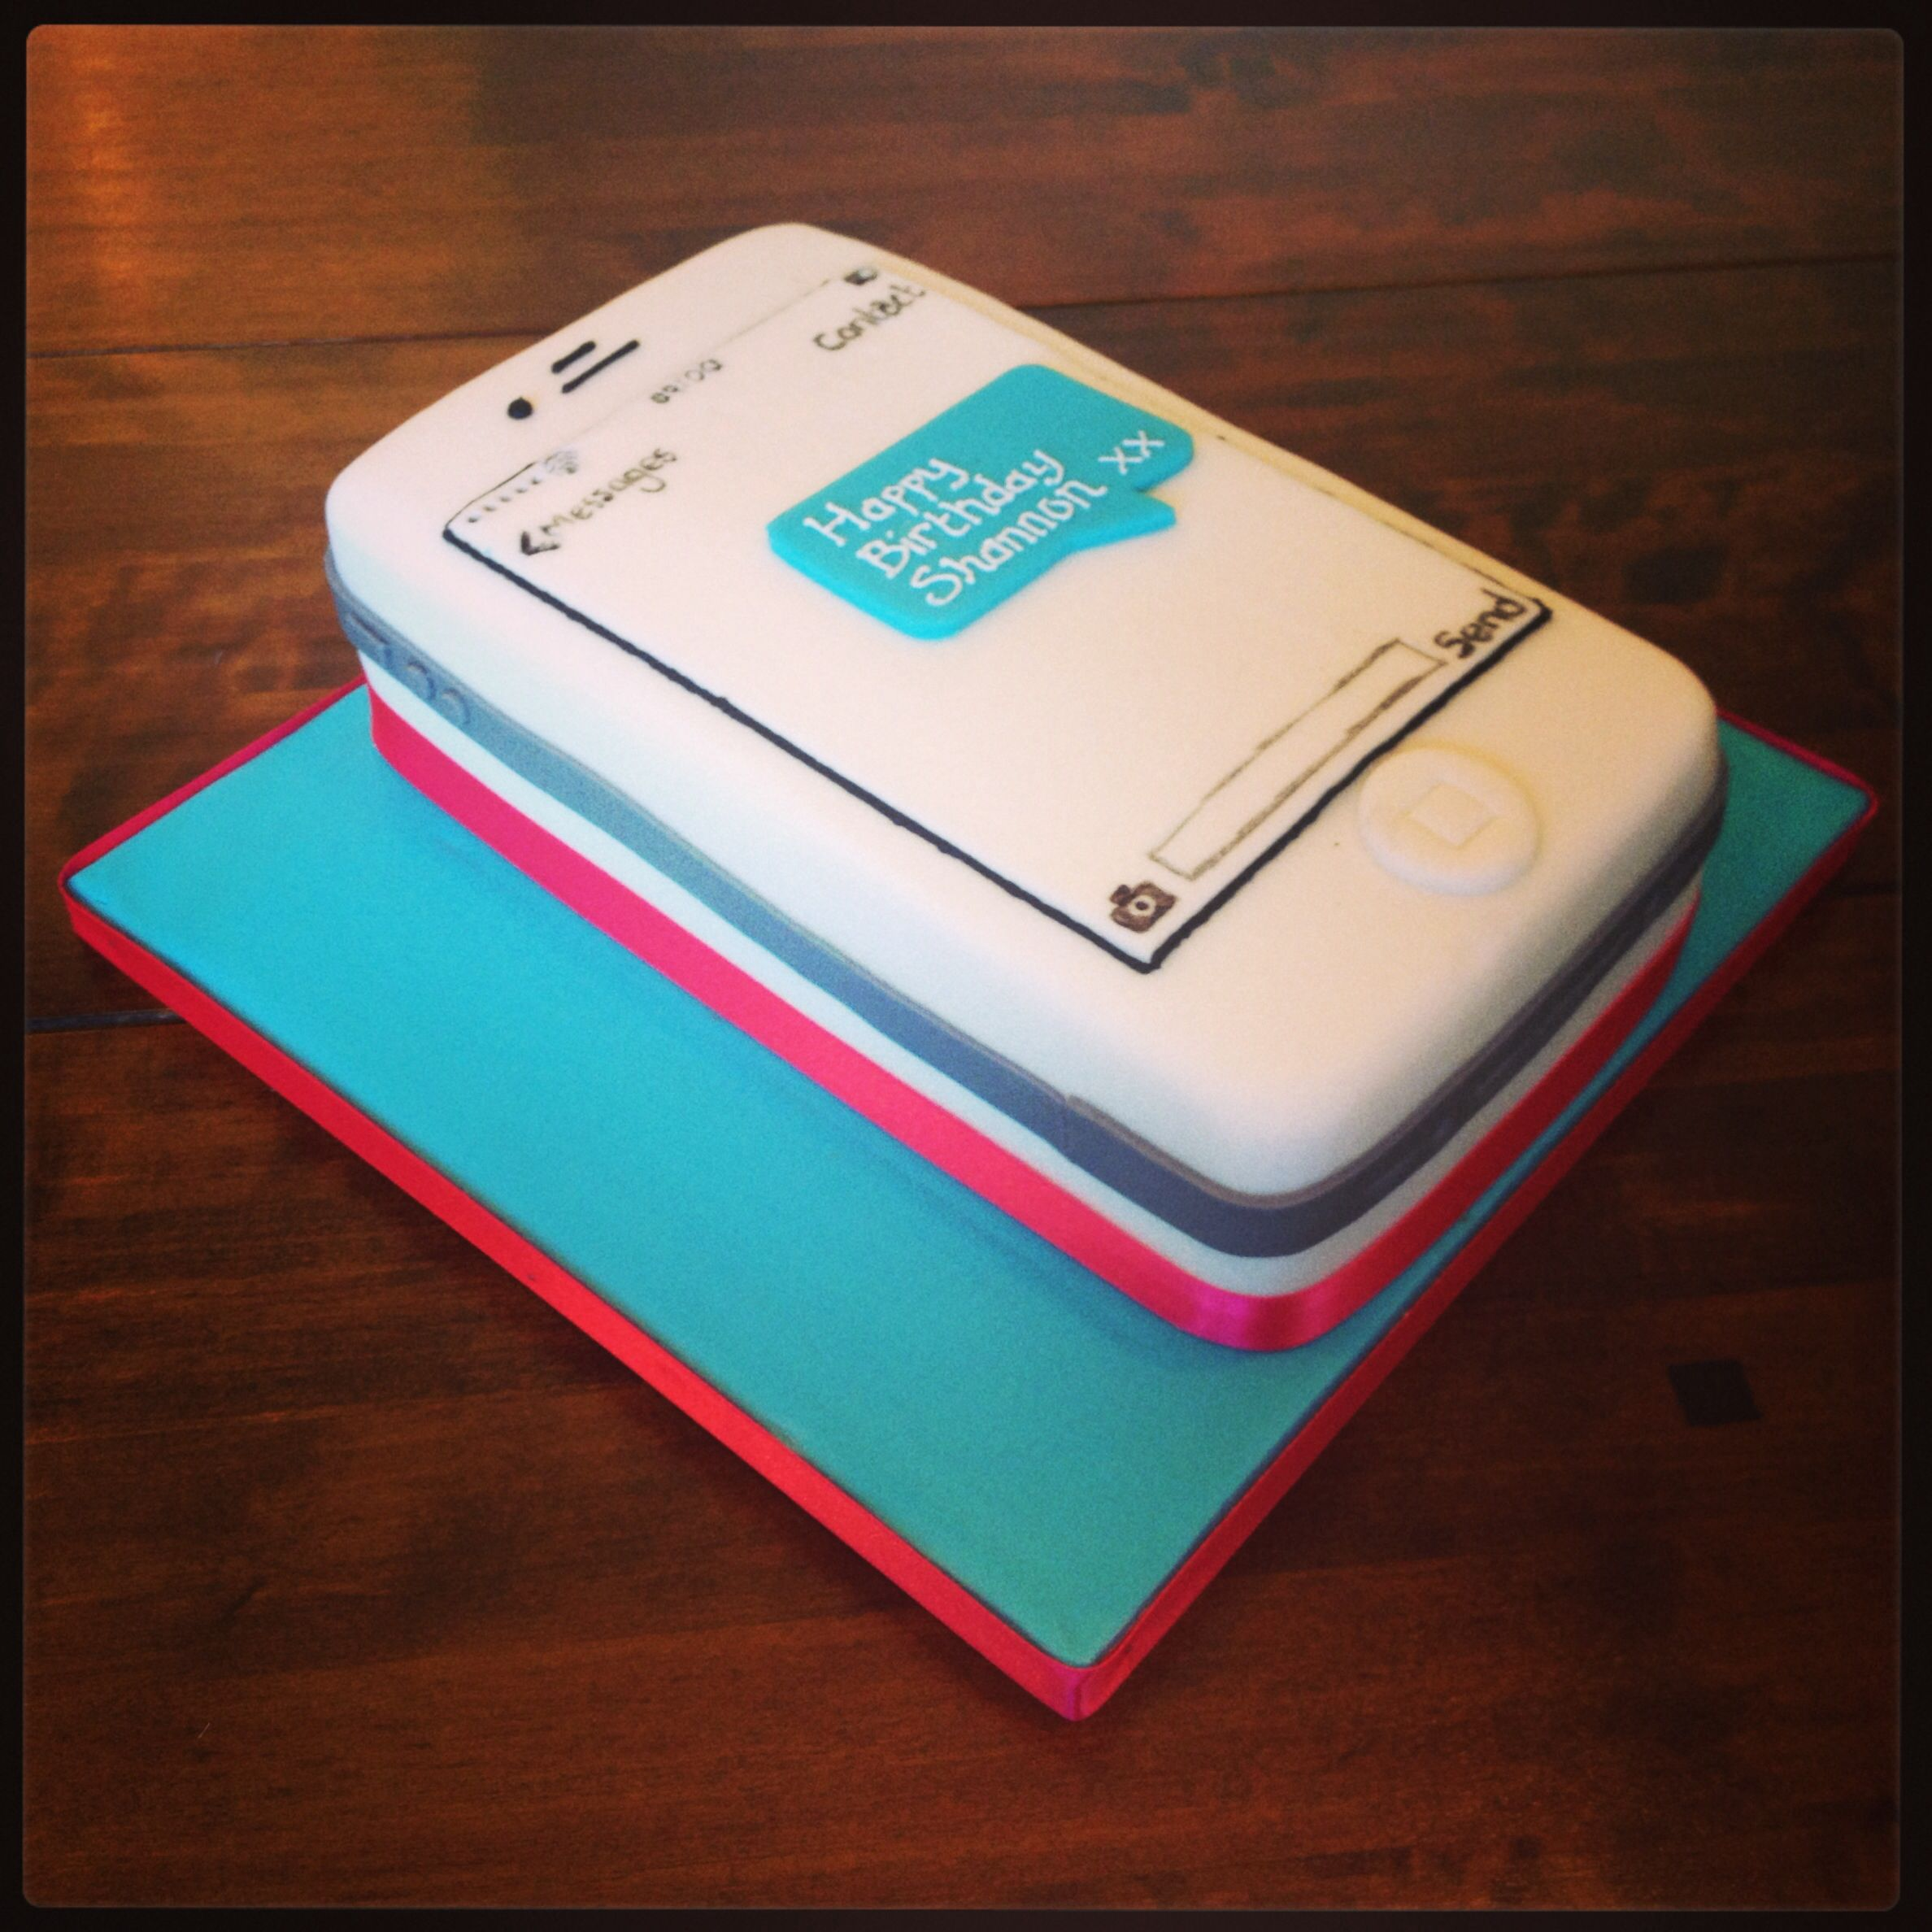 Awe Inspiring Iphone Birthday Cake Recipe Funny Birthday Cards Online Aeocydamsfinfo